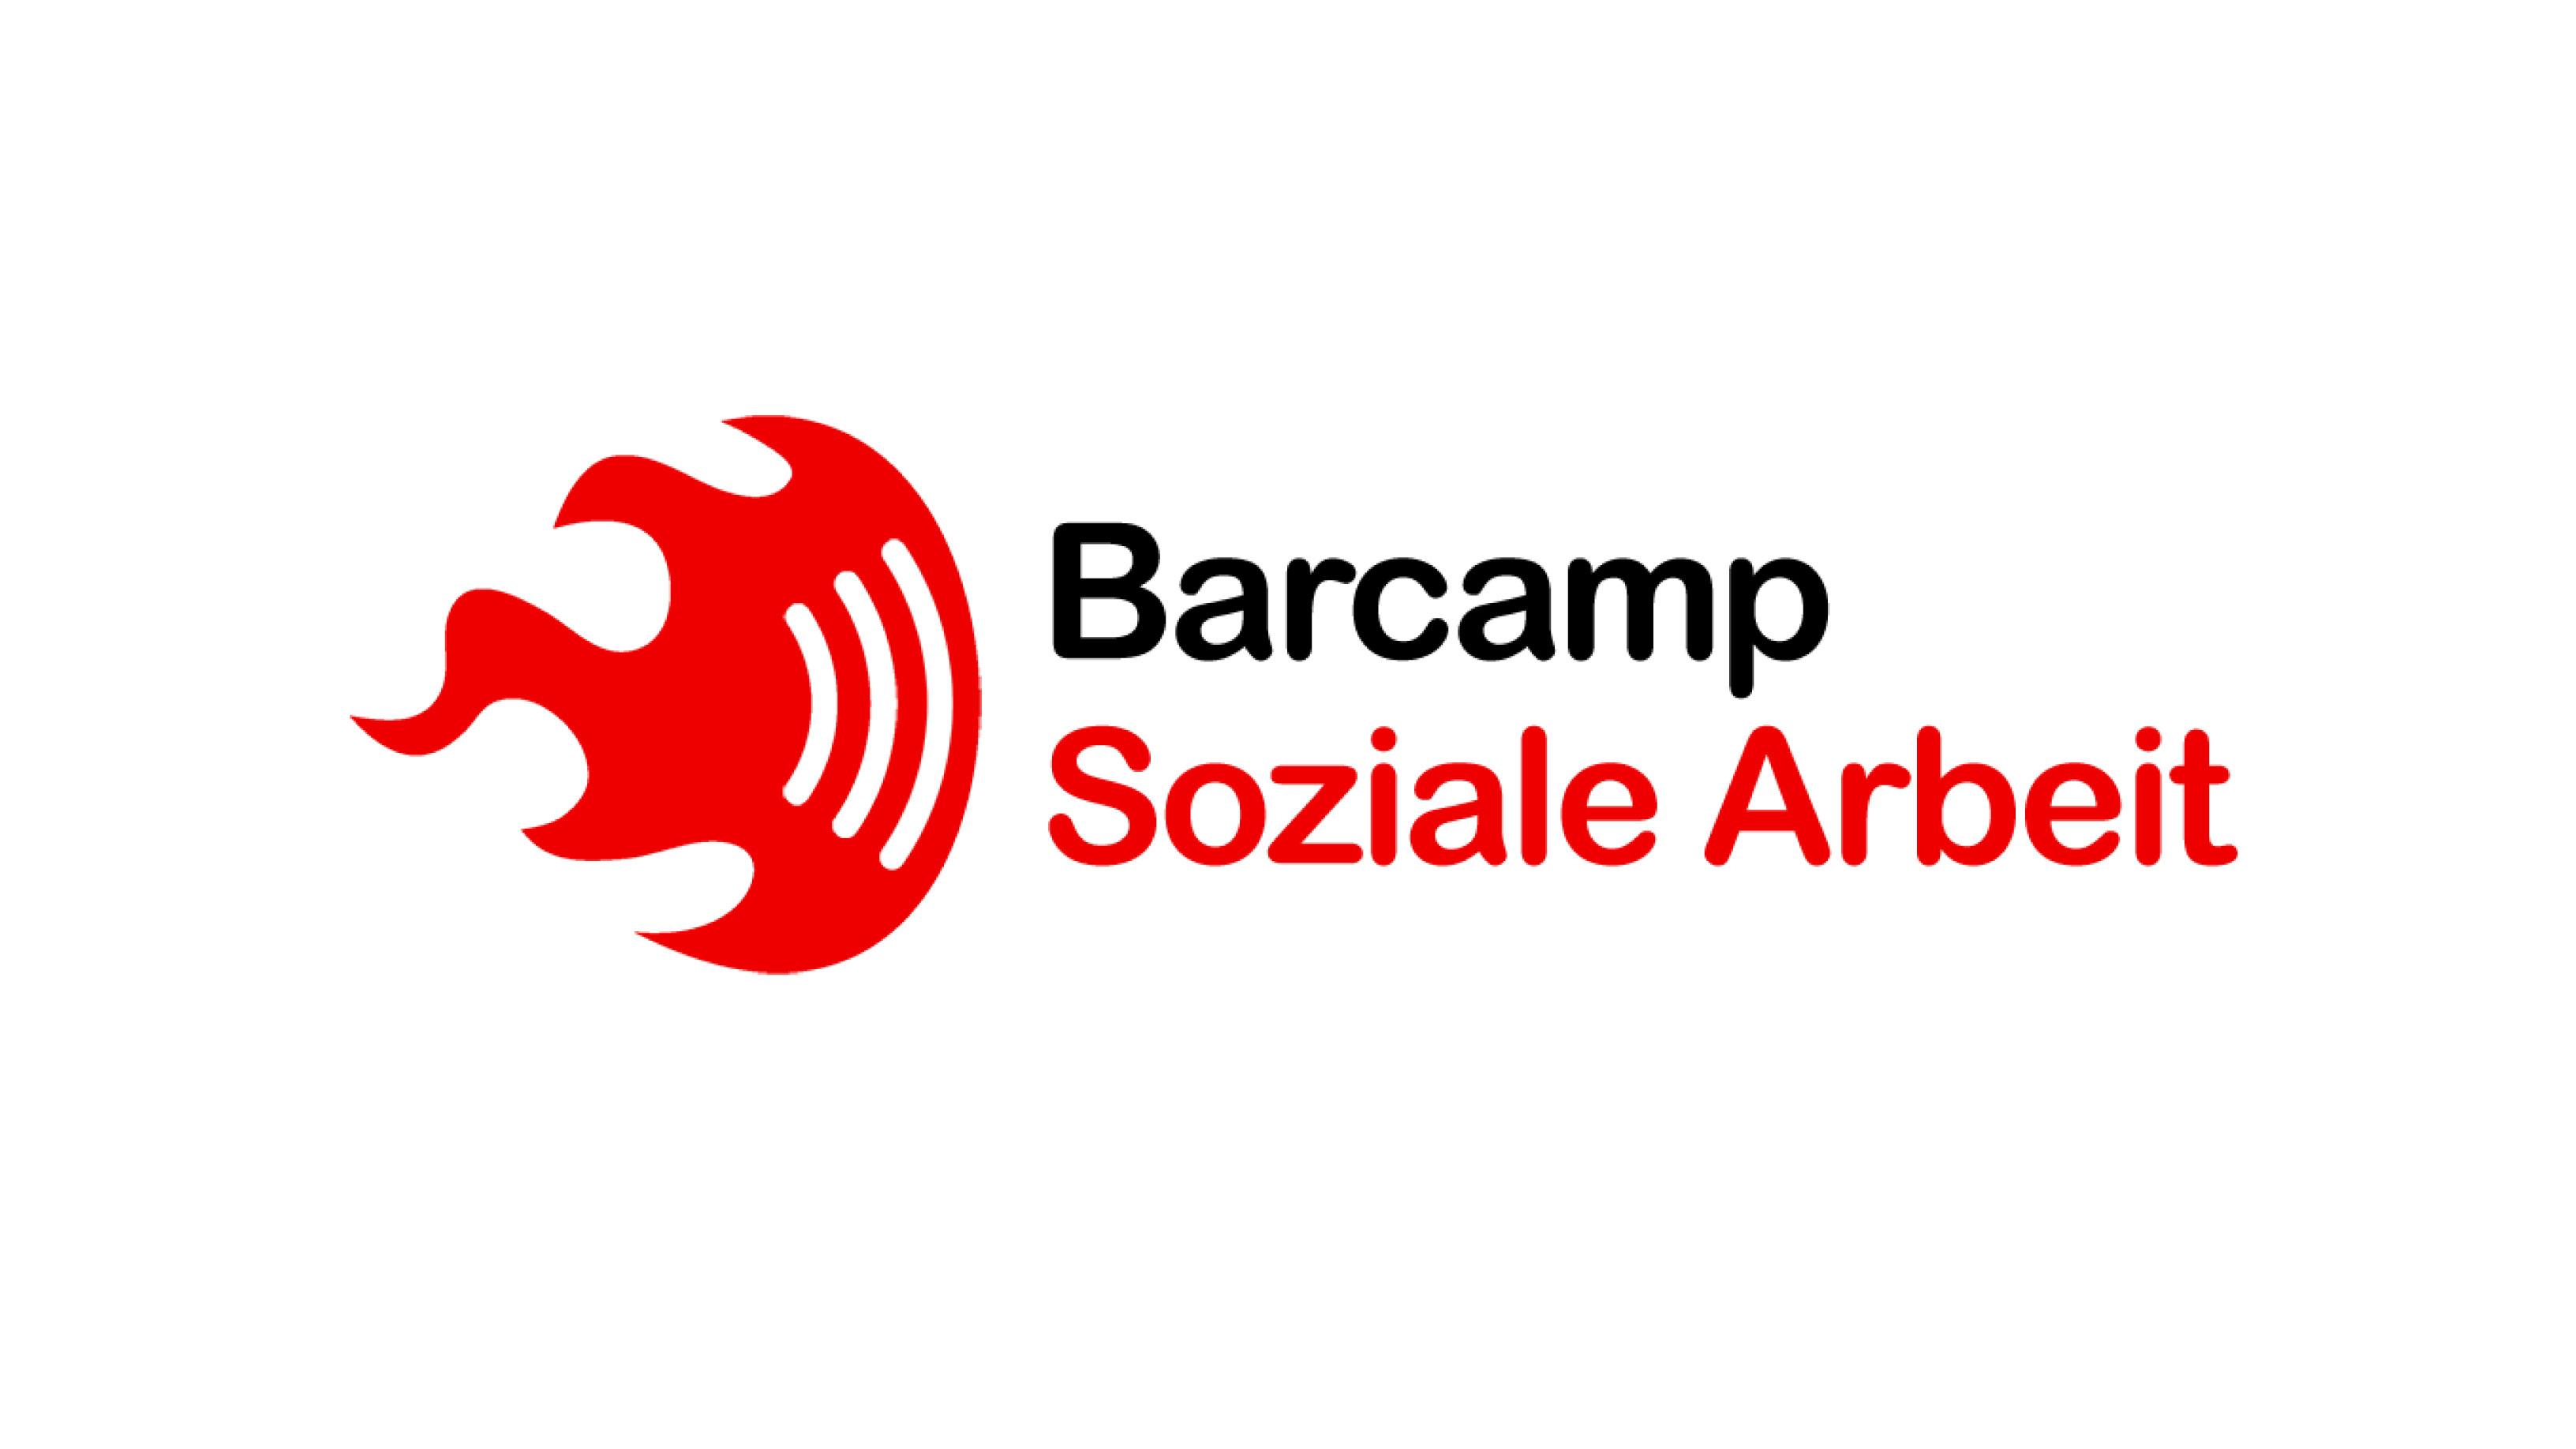 Barcamp Soziale Arbeit